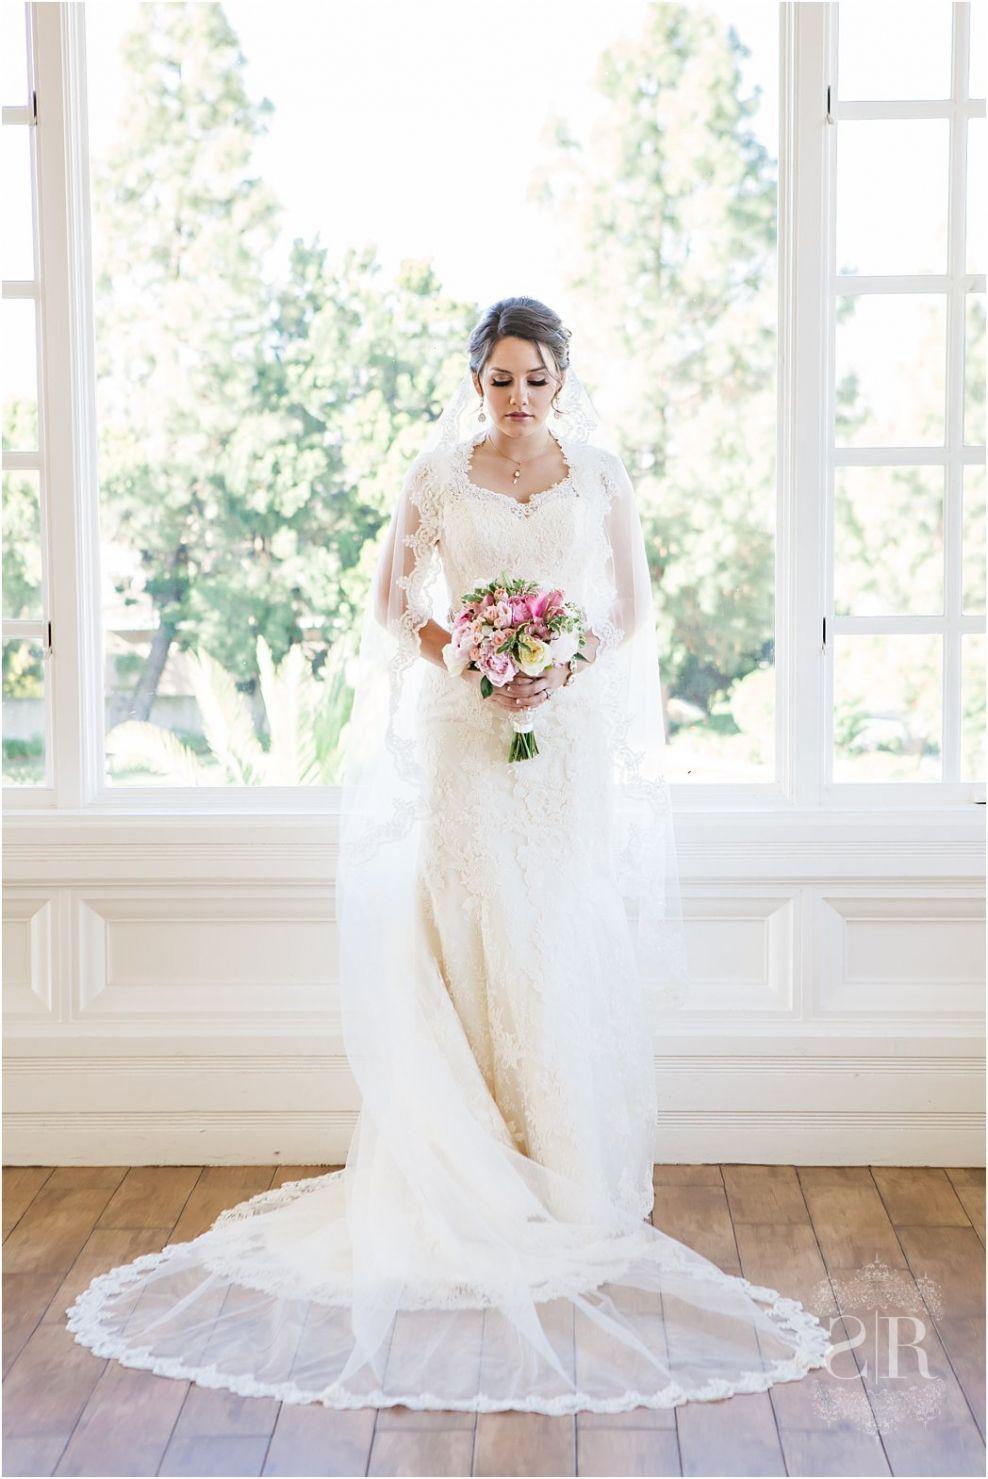 Beautiful lace wedding dress with sleeves vintage heirloom look long